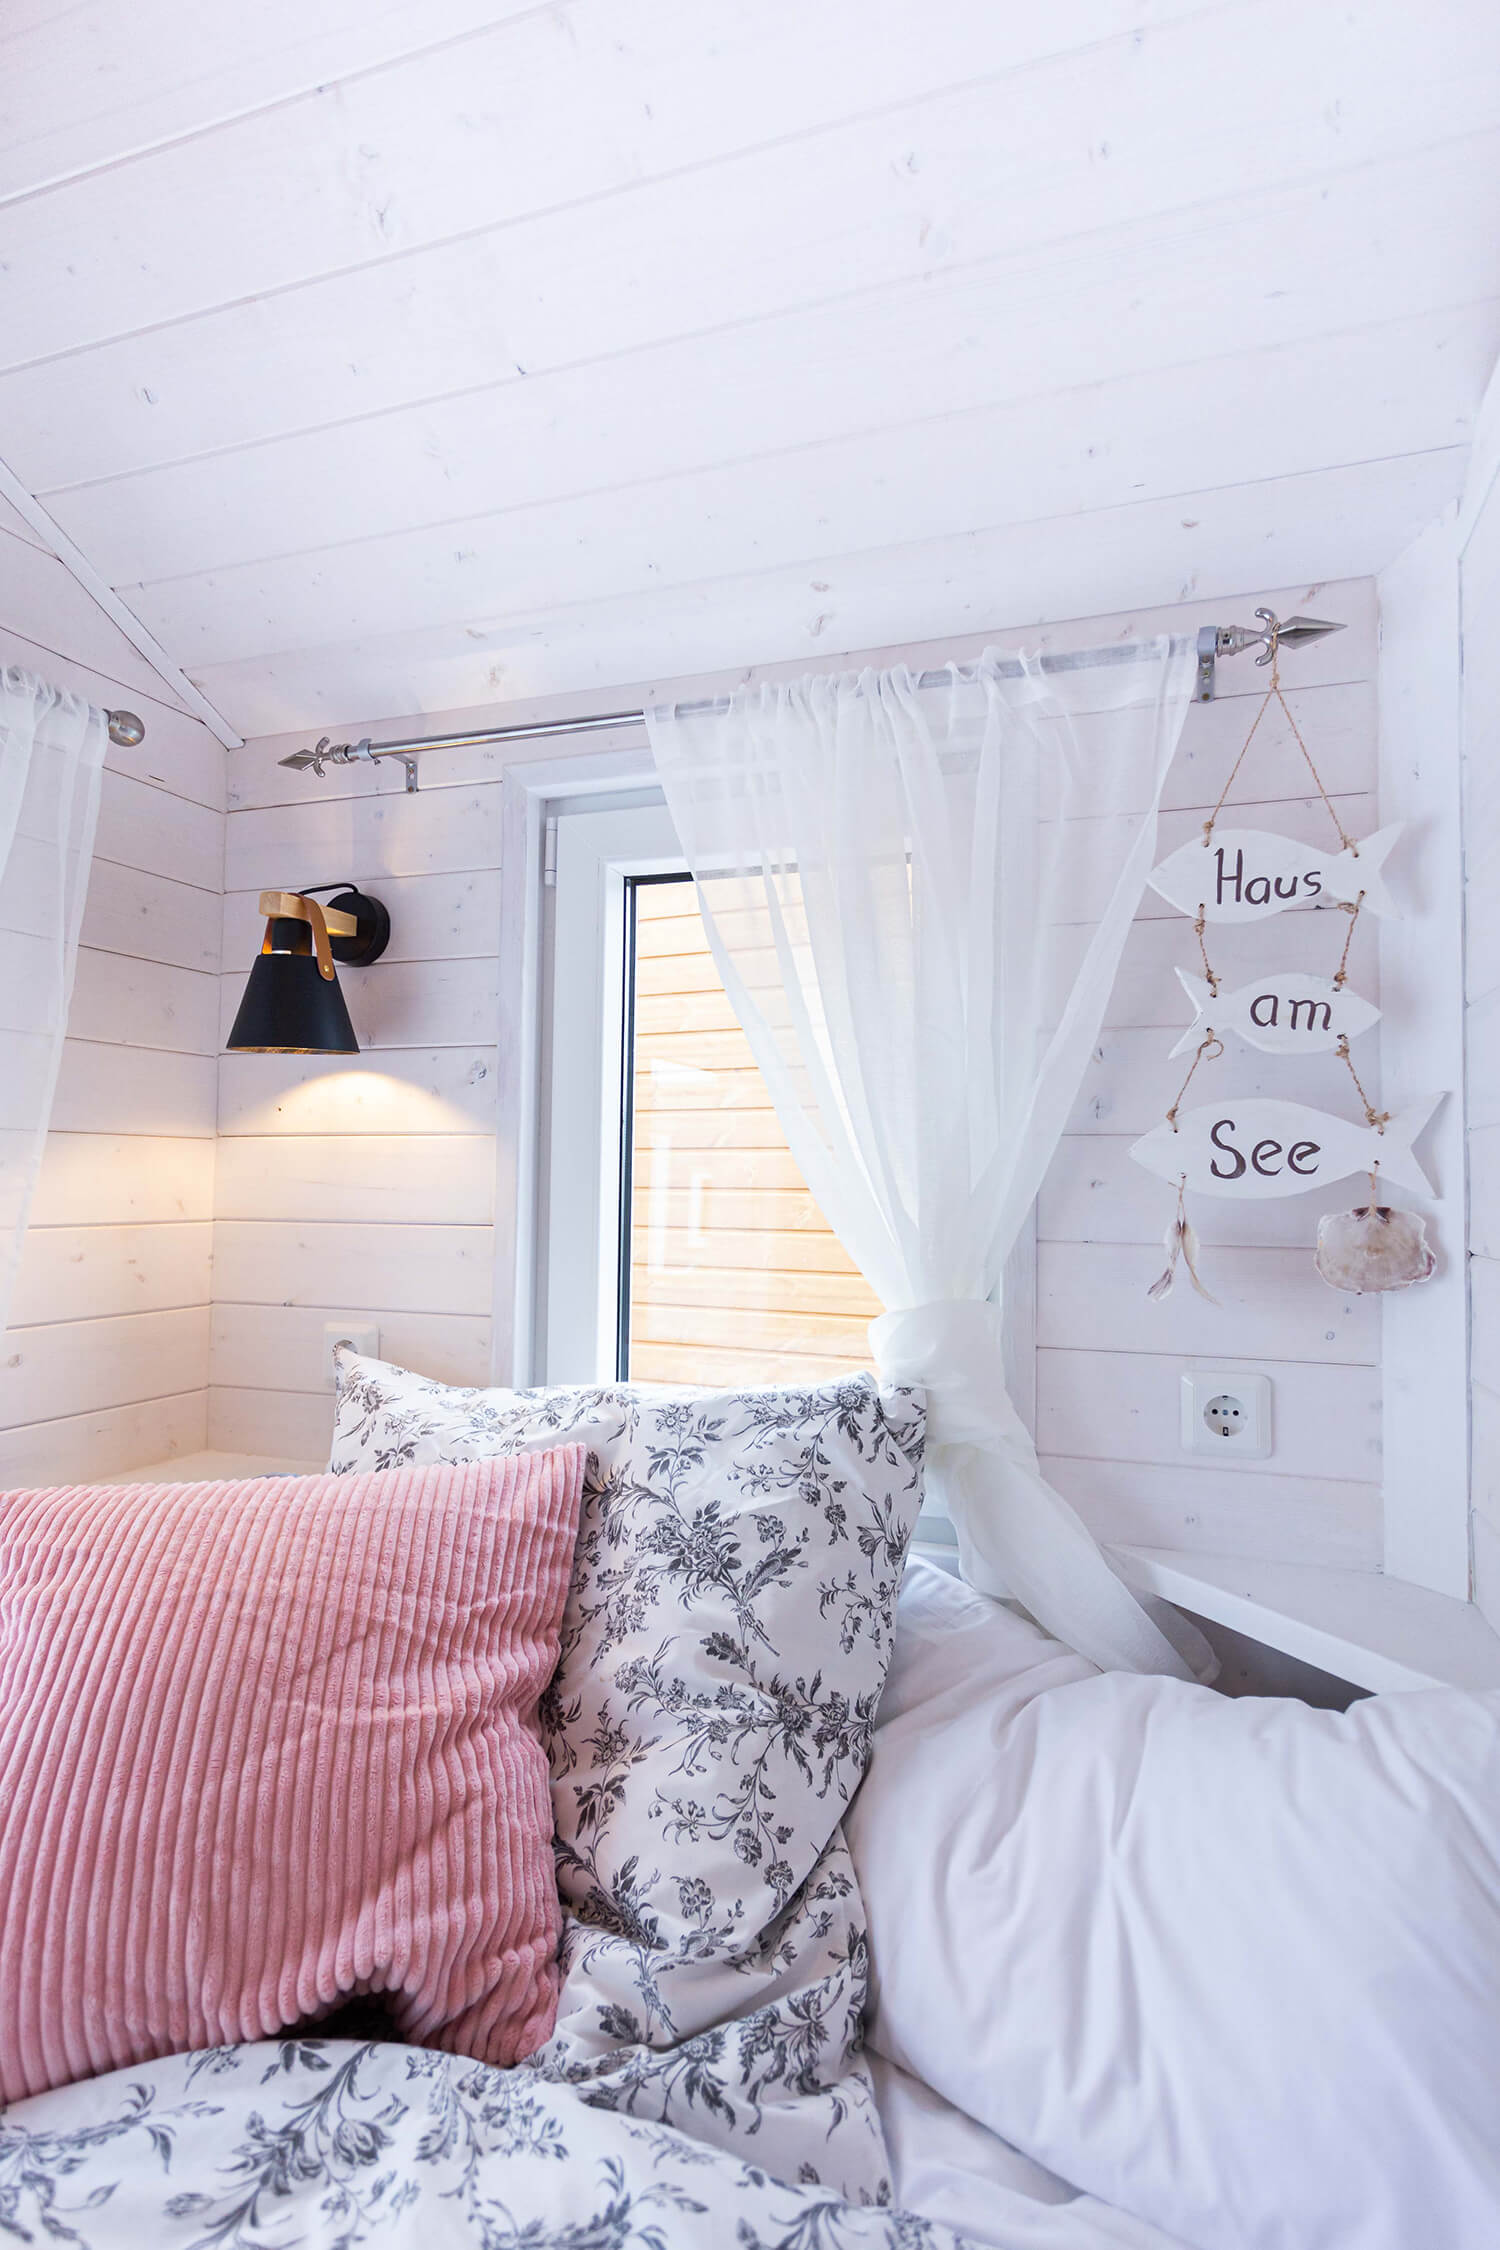 mobiles-tiny-house-kueste-vital-camp-gmbh31